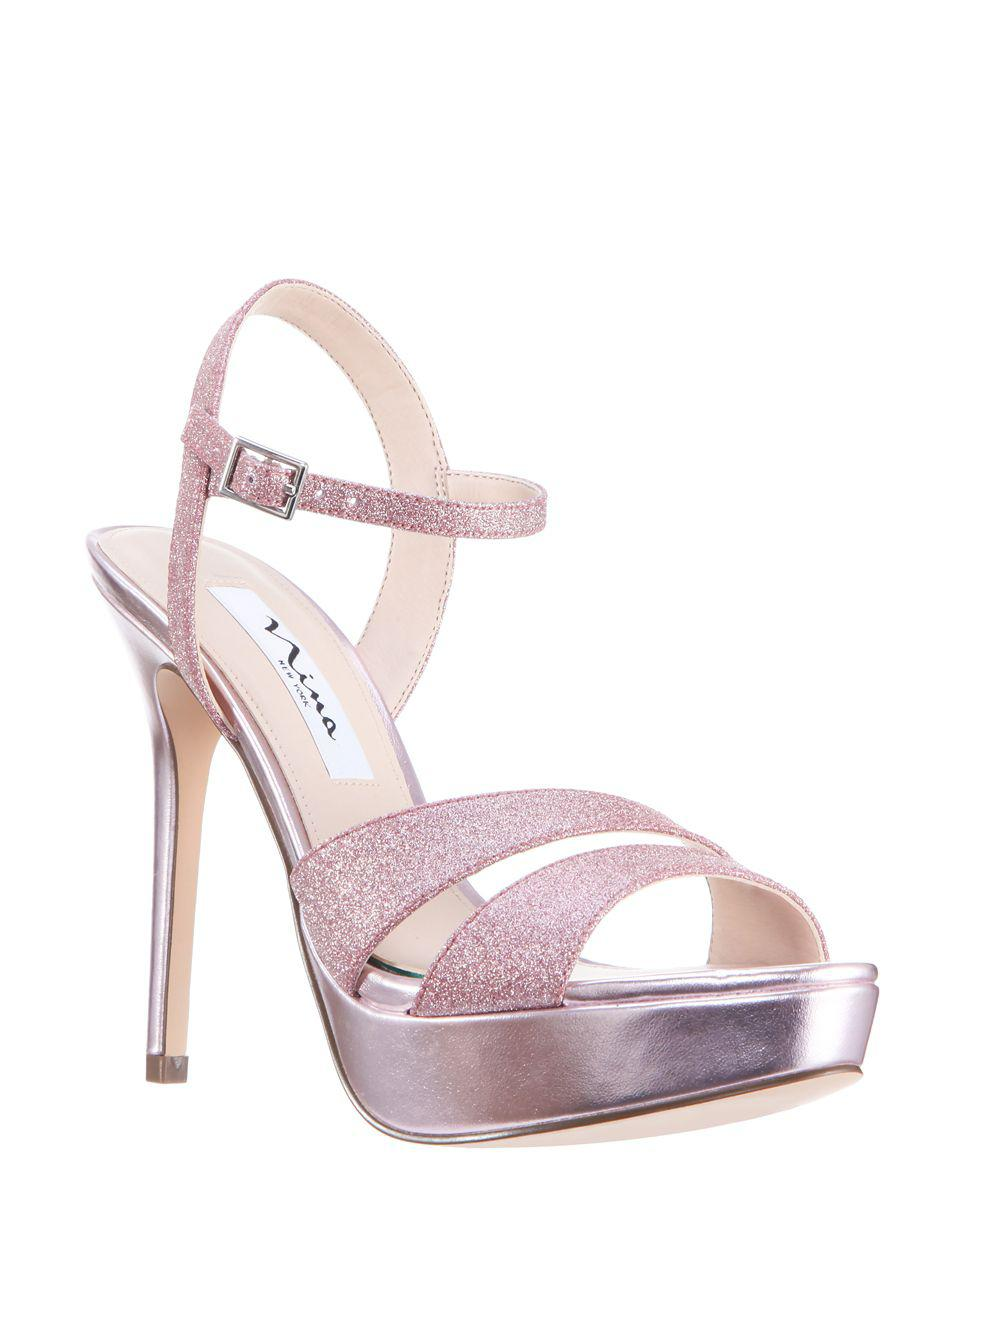 NINA Silana Platform Sandals From China Online Ebay Sale Online XoFd7bqfZC